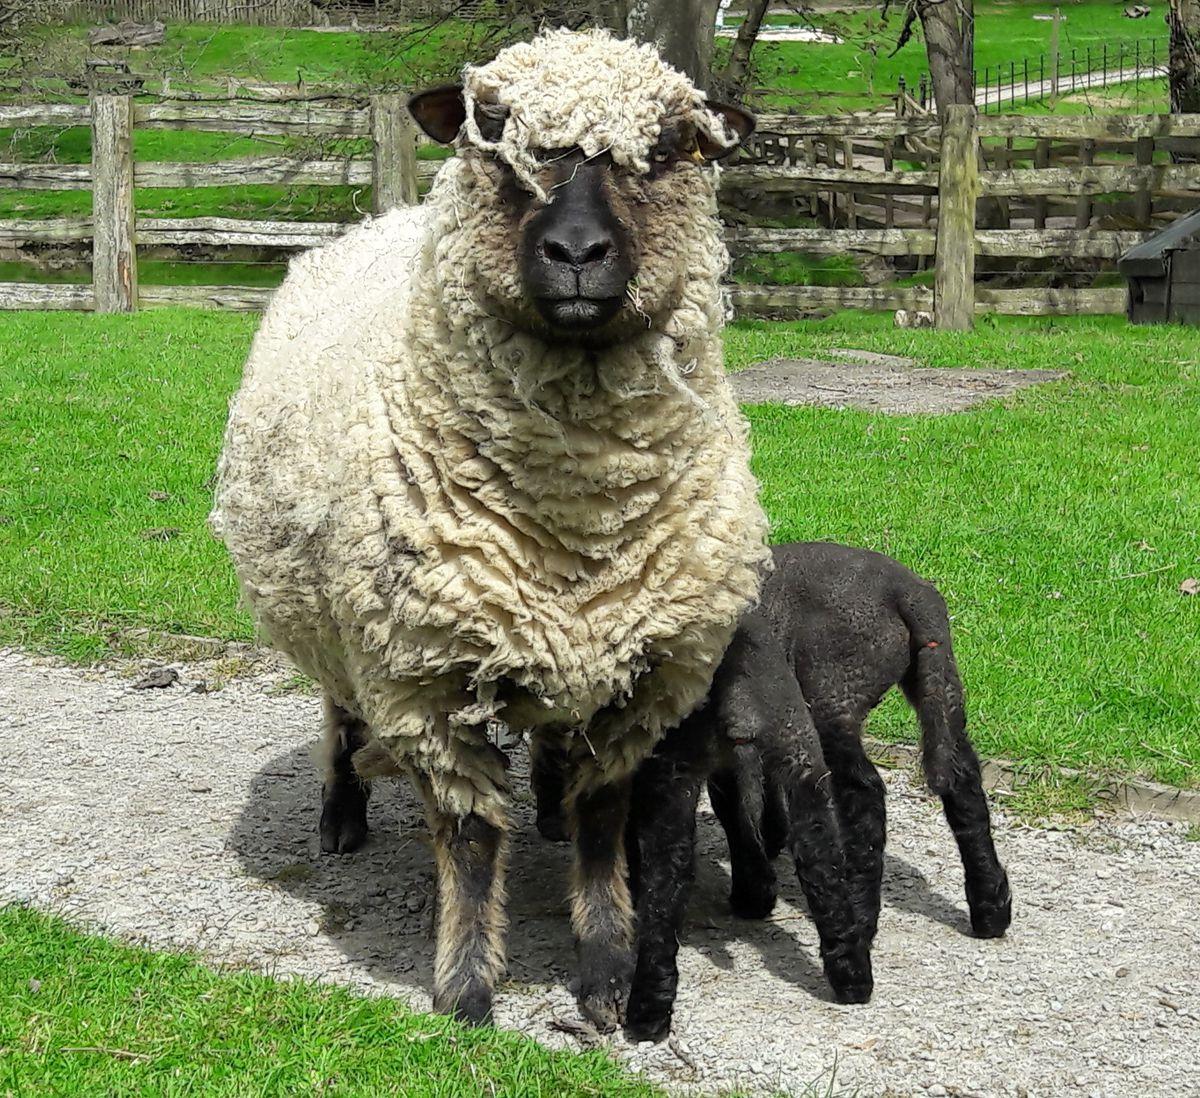 Sheep at Acton Scott Historic Working Farm